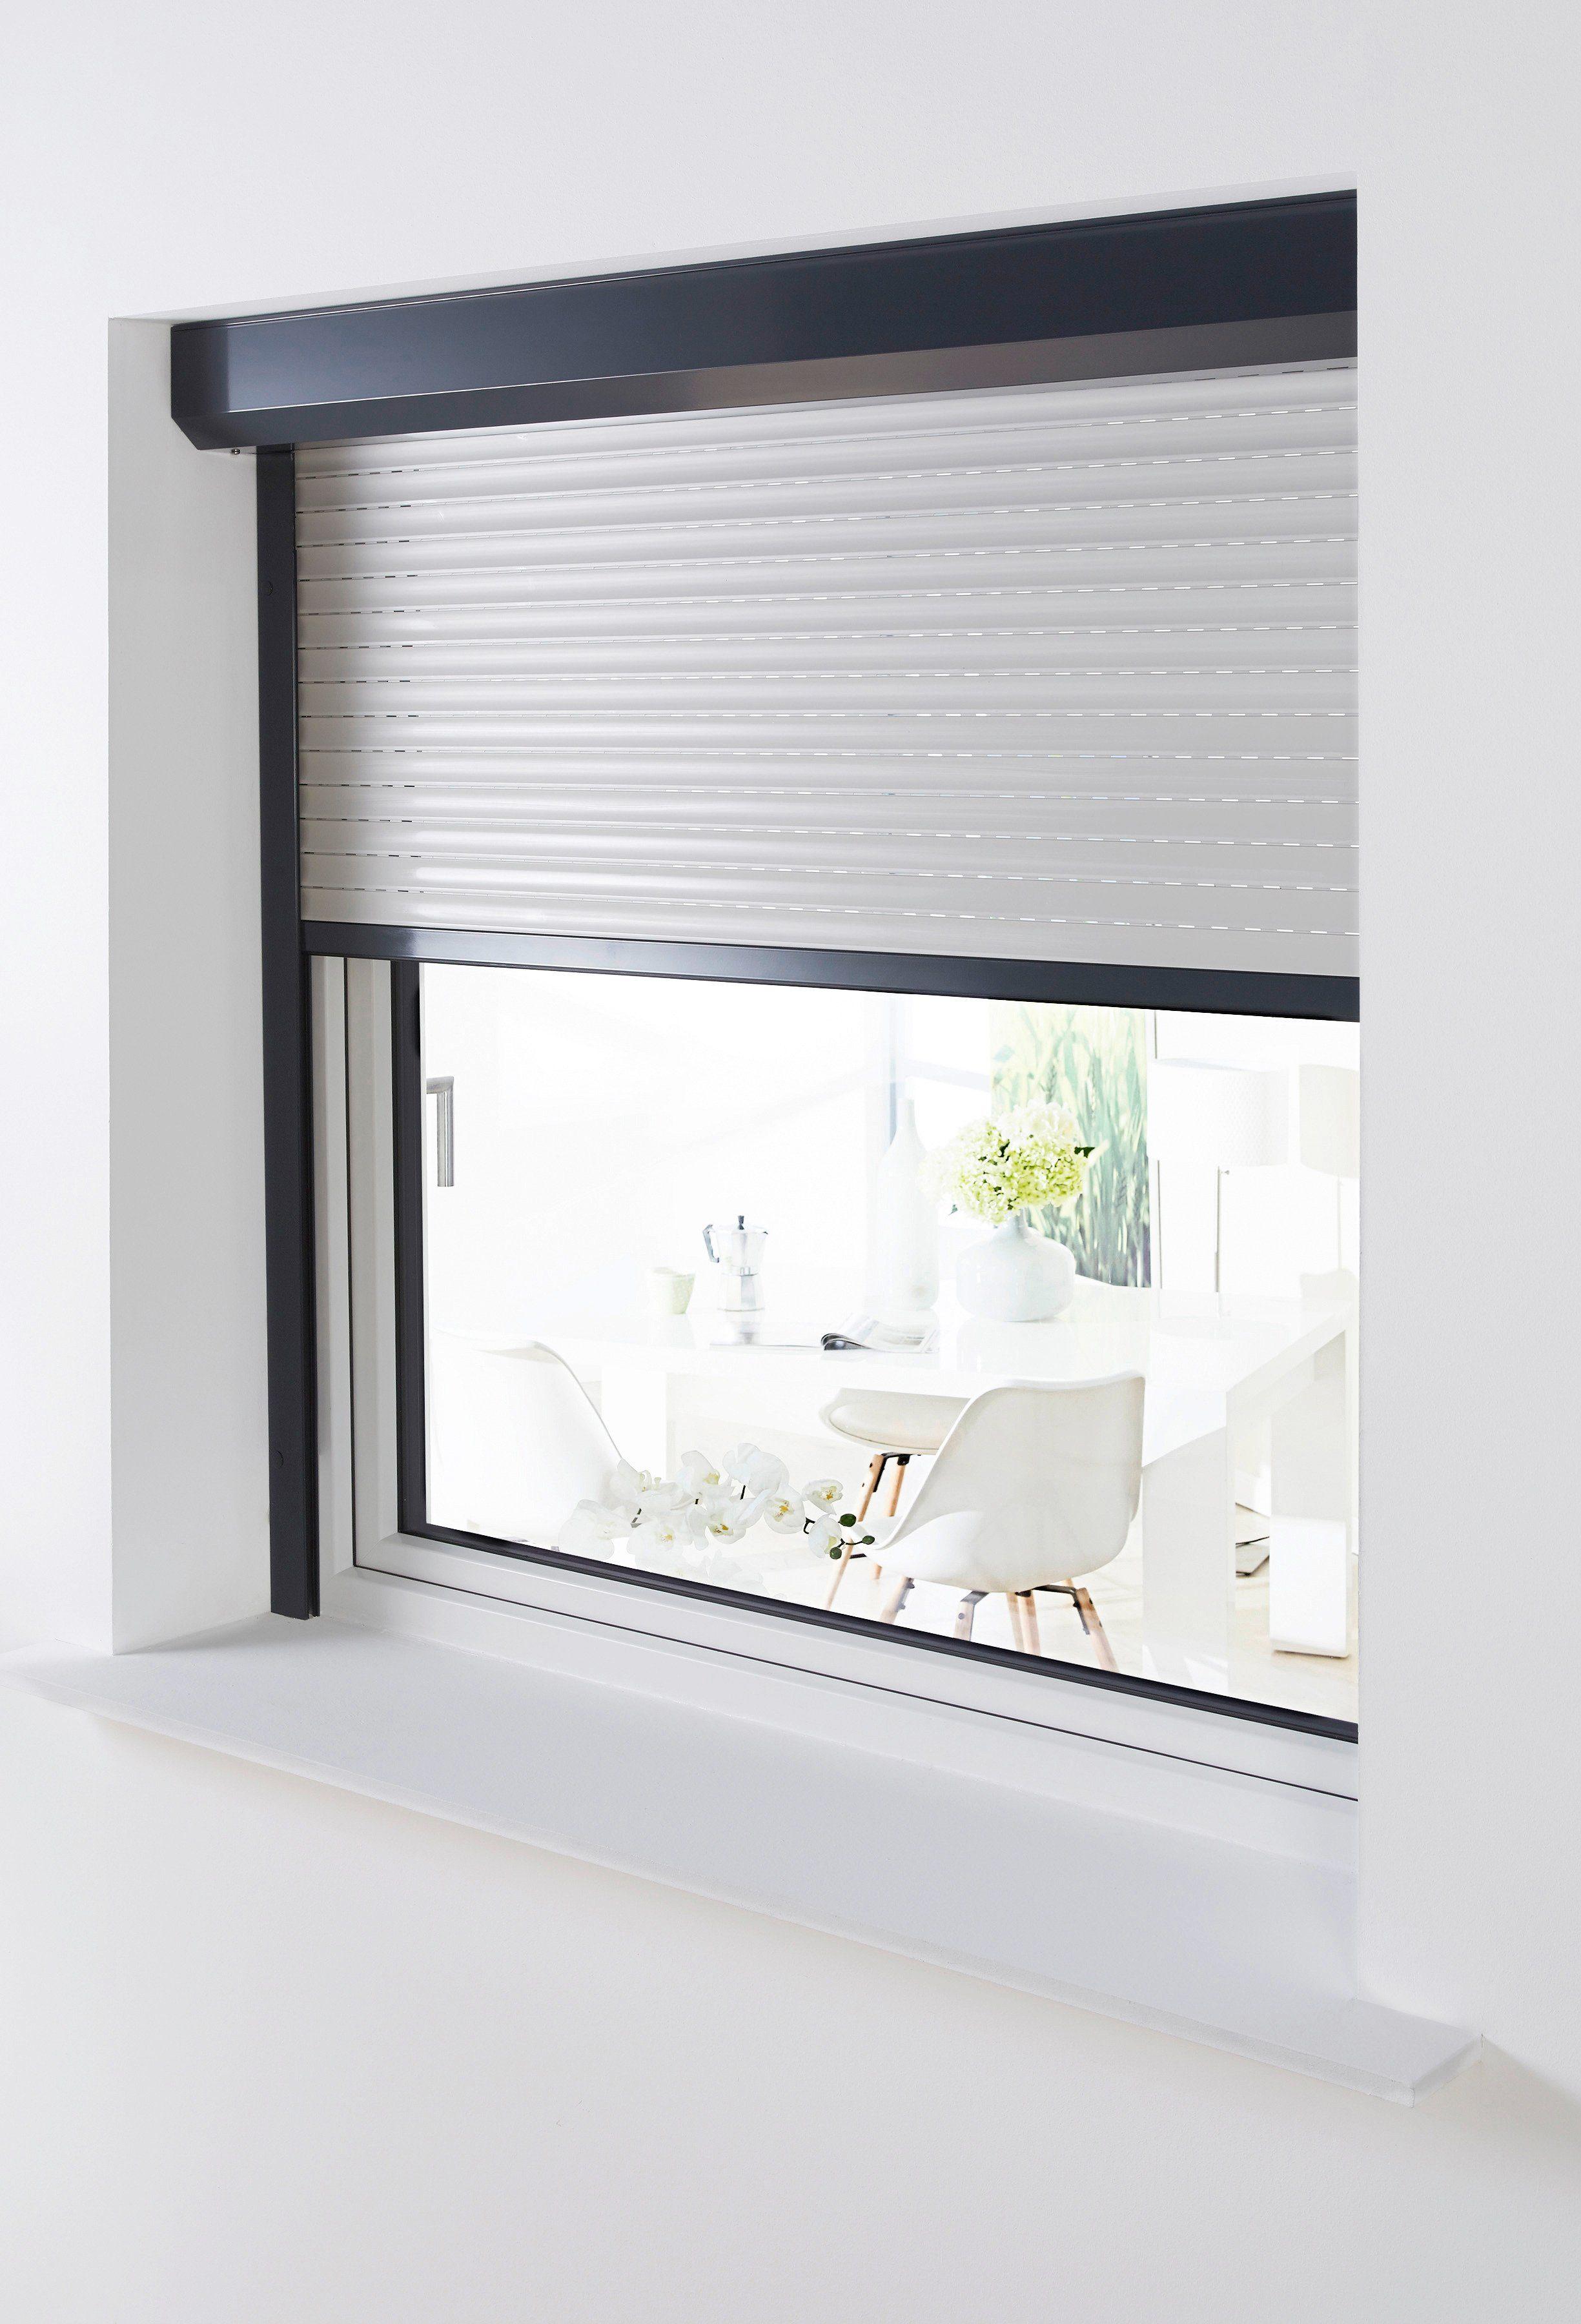 Aluminium »Vorbau Rollladen« Sondermaß Breite, Höhe: 100 cm, anthrazit-grau